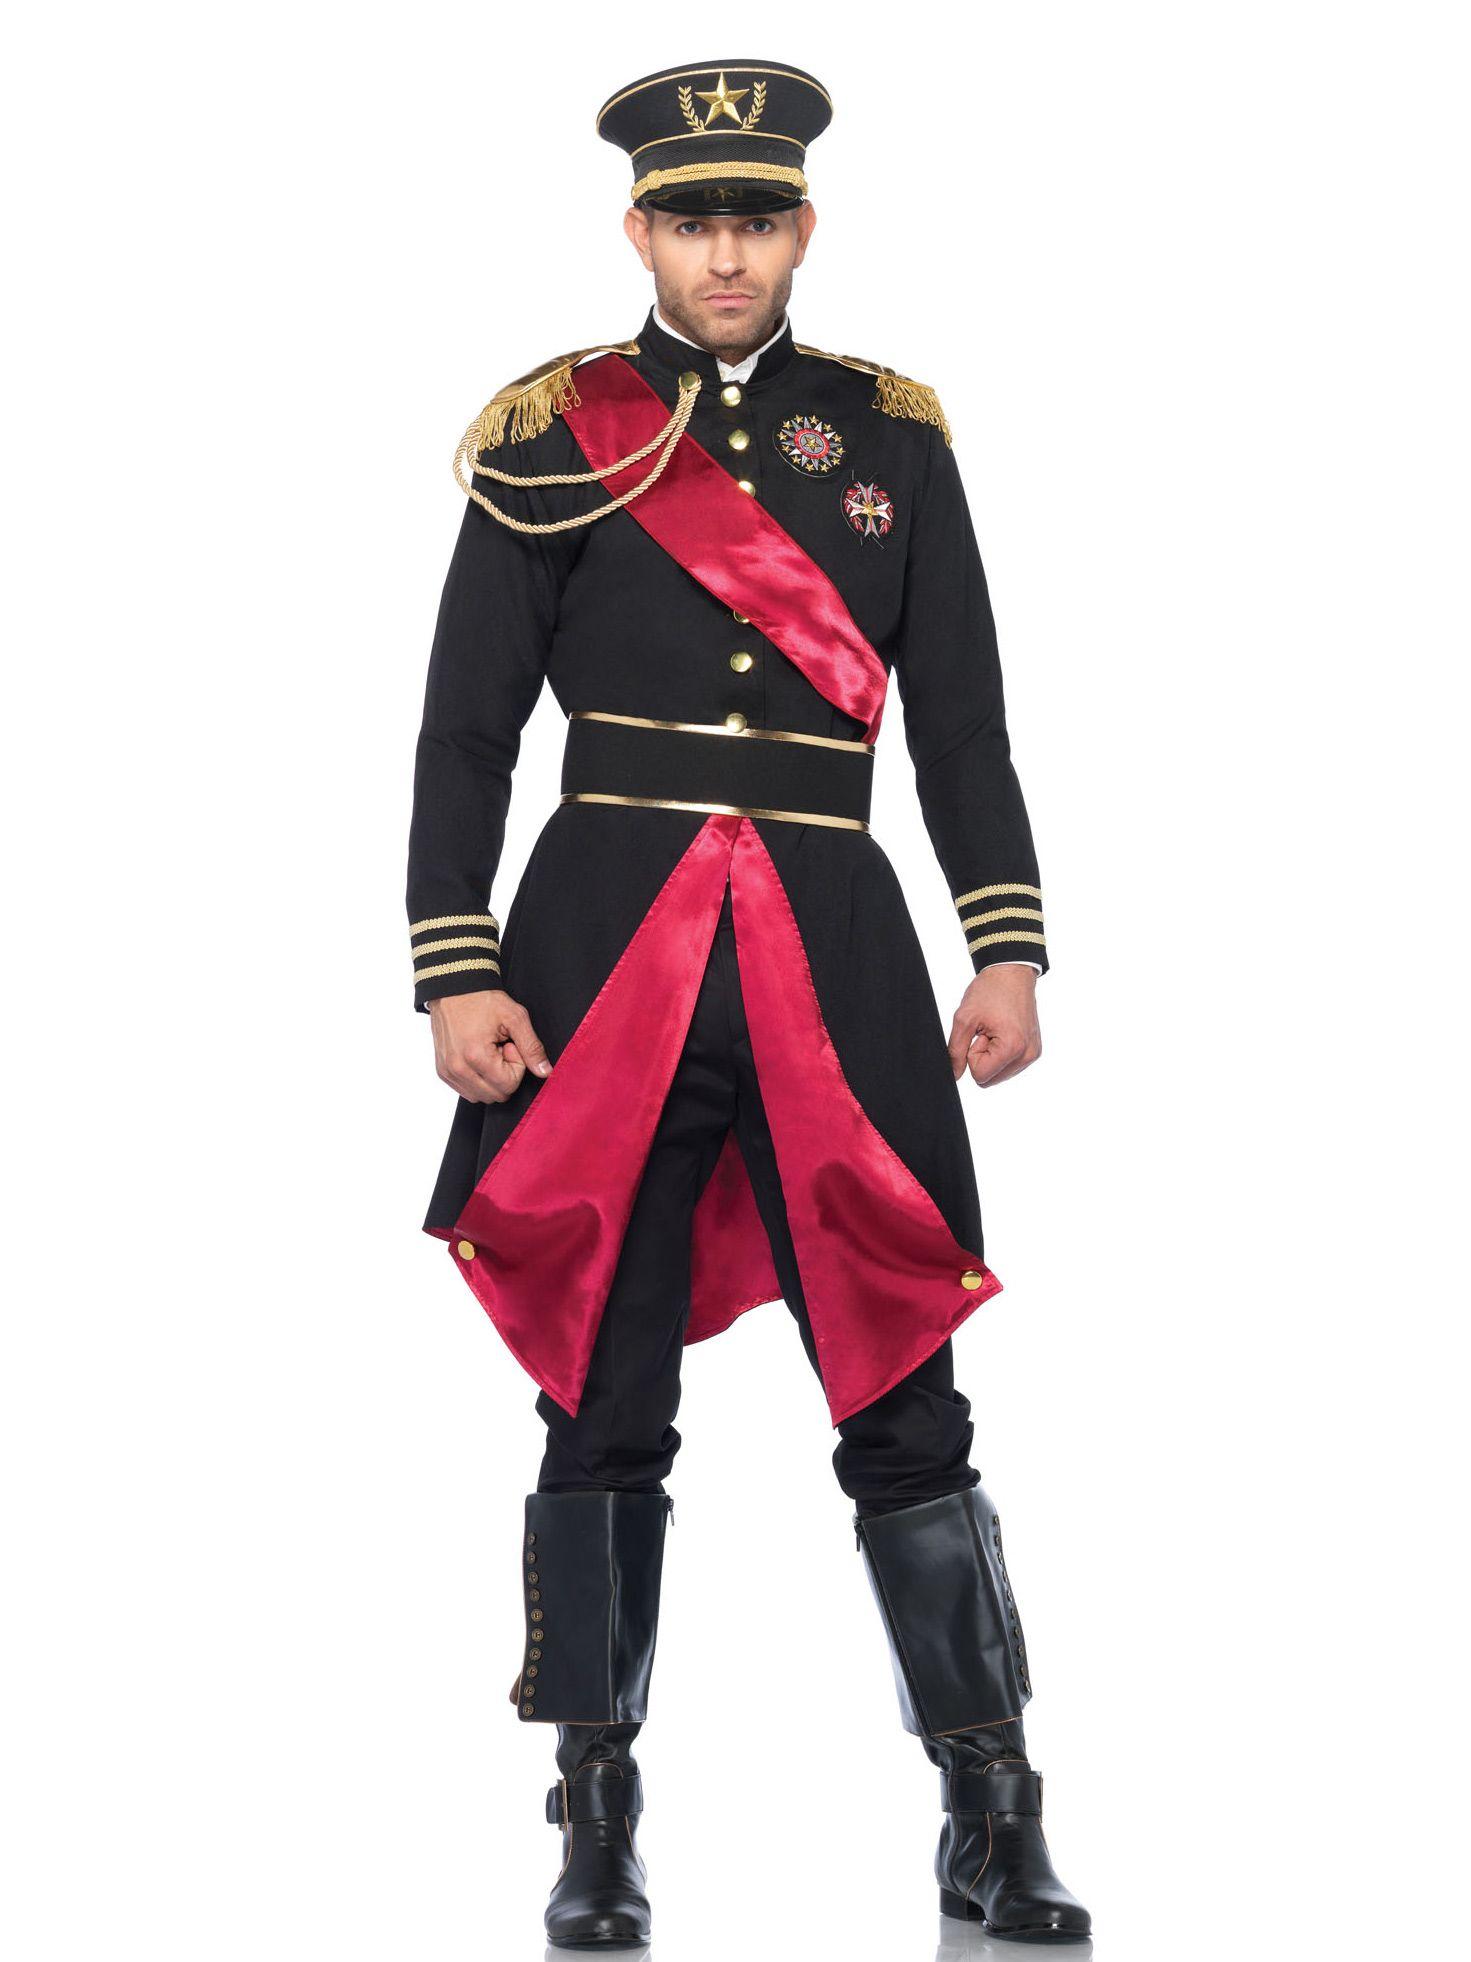 Smi Herren Kostüm Feuerwehrmann Jacke Hose Karneval Fasching